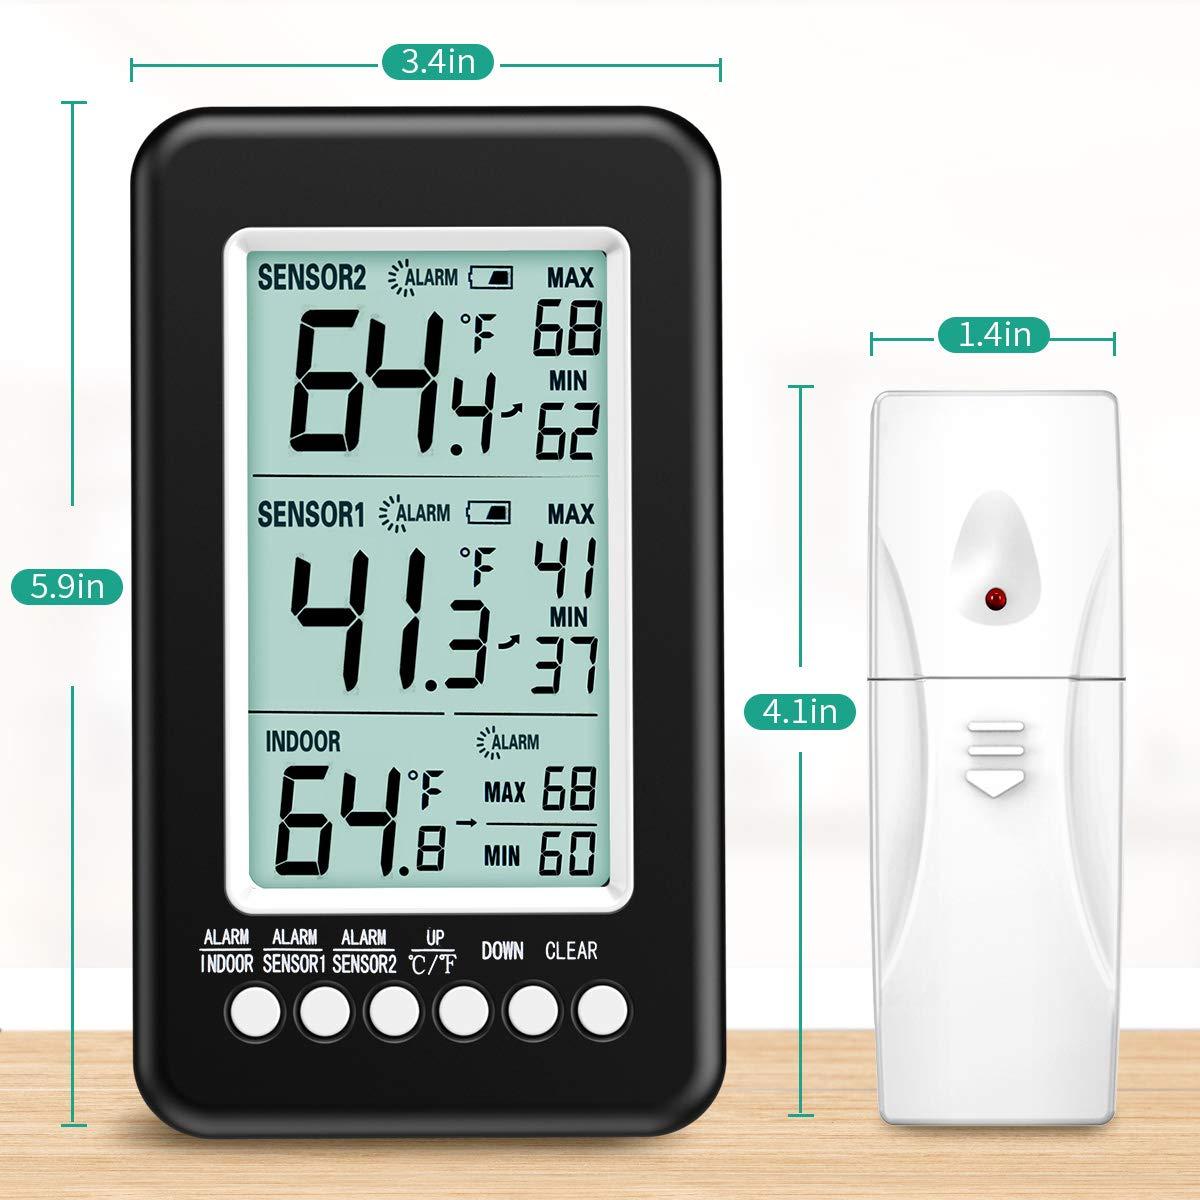 Congelador Term/ómetro Registro MAX//MIN ORIA Digital Term/ómetro del Refrigerador Term/ómetro para Nevera con 2 Sensores Inal/ámbrico y Alarma Audible 4.3 Pantalla LCD USB//Alimentado por Bater/ía